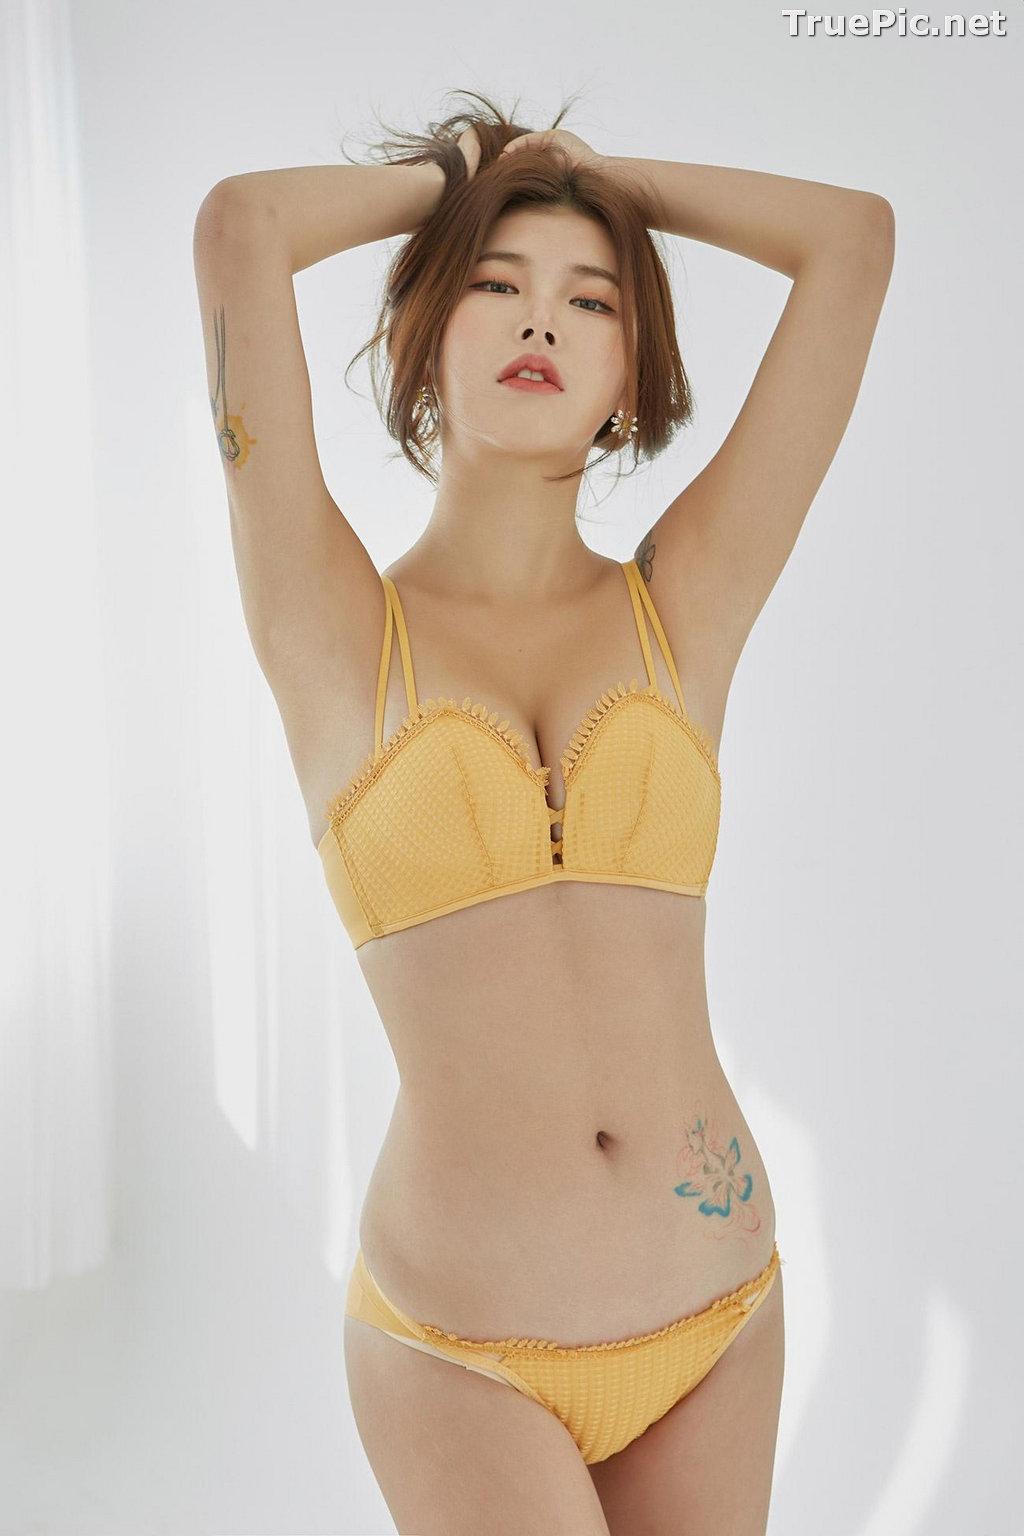 Image Korean Fashion Model – Da Yomi (다요미) – Lountess Spring Lingerie #3 - TruePic.net - Picture-1